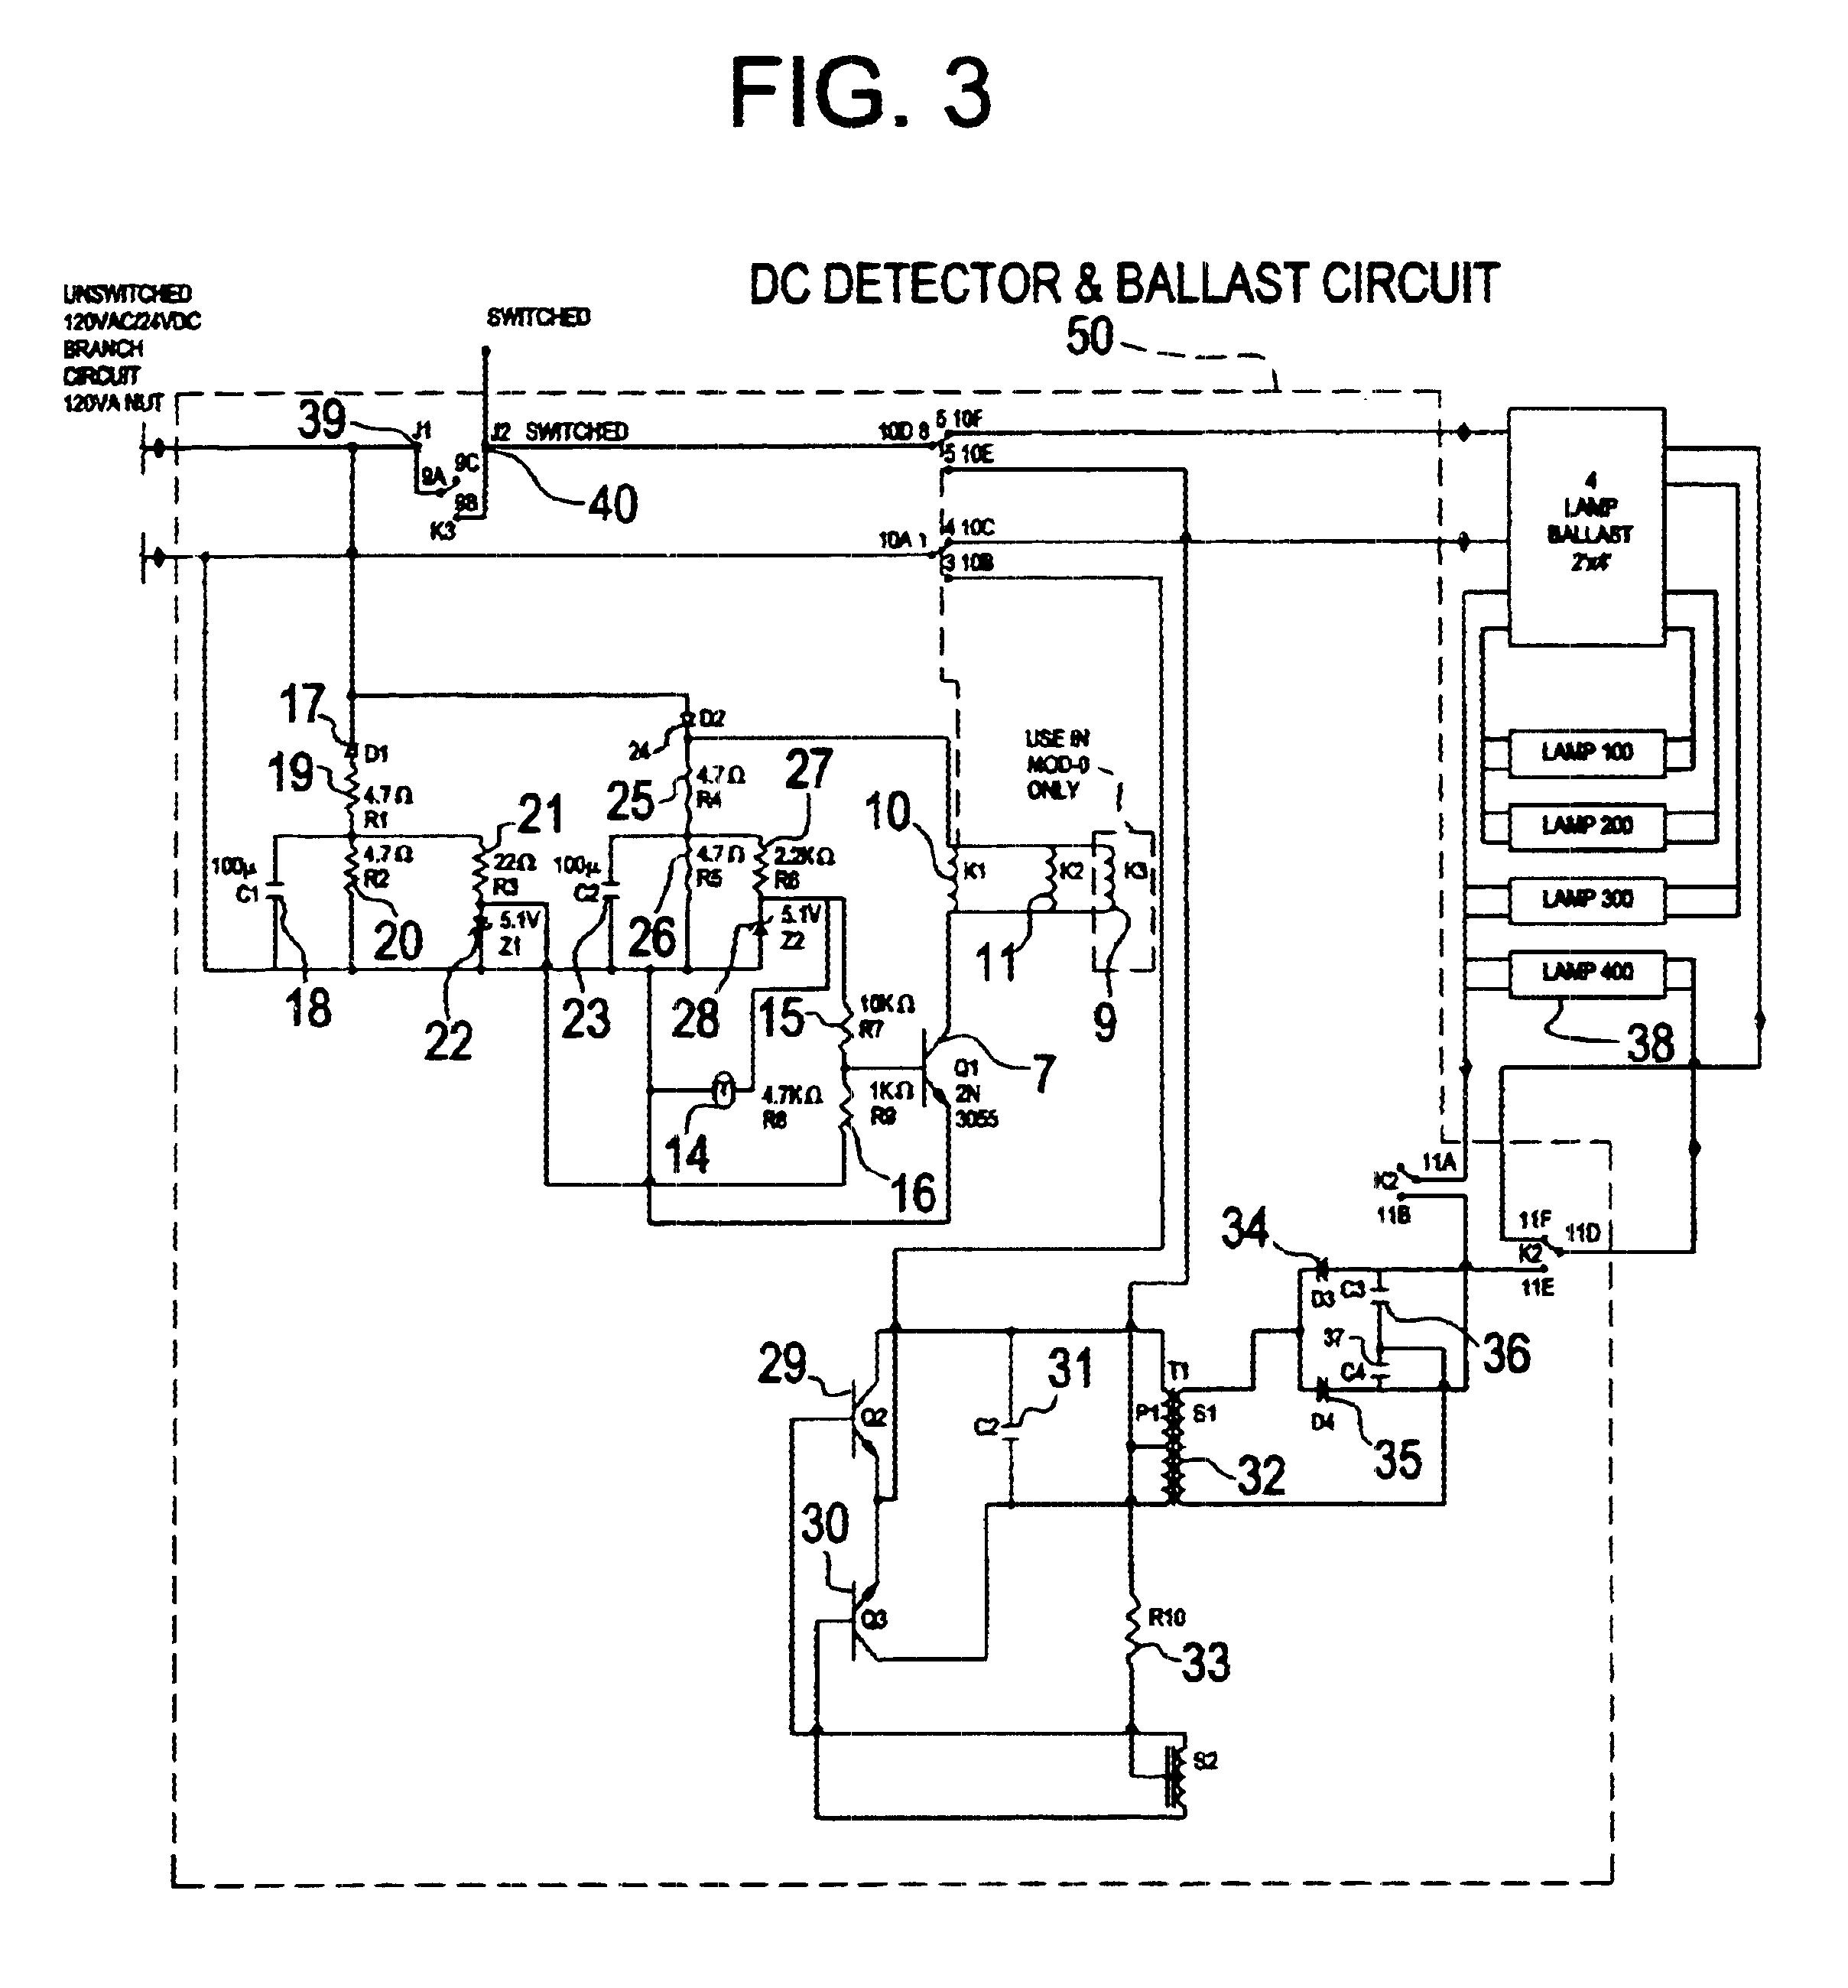 bodine emergency ballast wiring diagram on bodine emergency wiring- diagram, bodine b90 wiring-